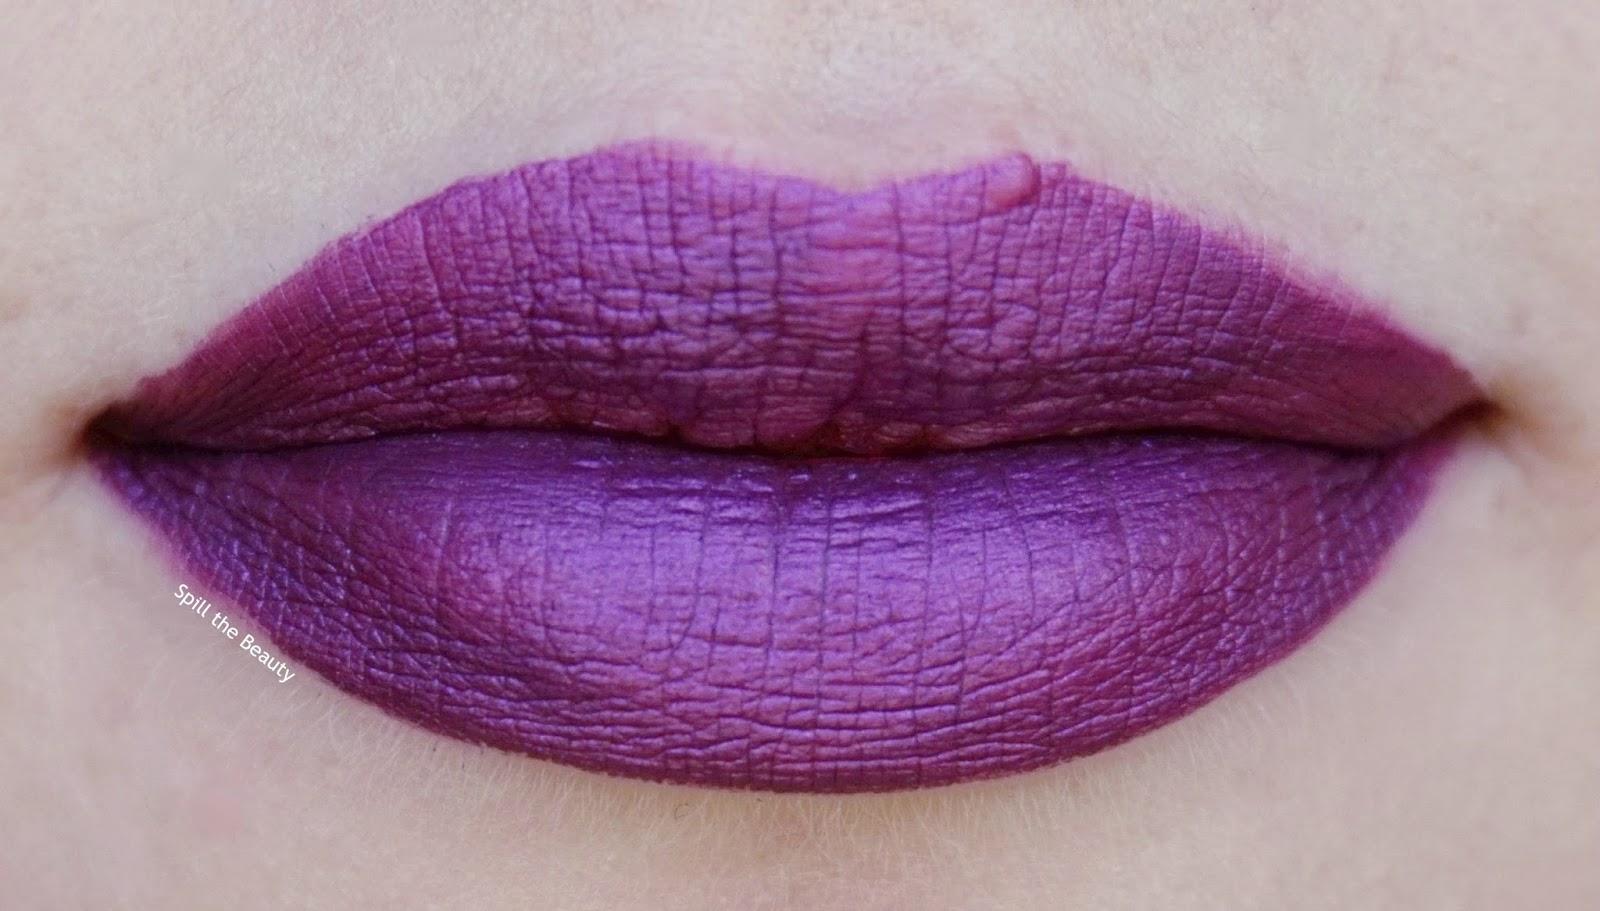 milani amore mattalic lip creme 08 raving matte lips